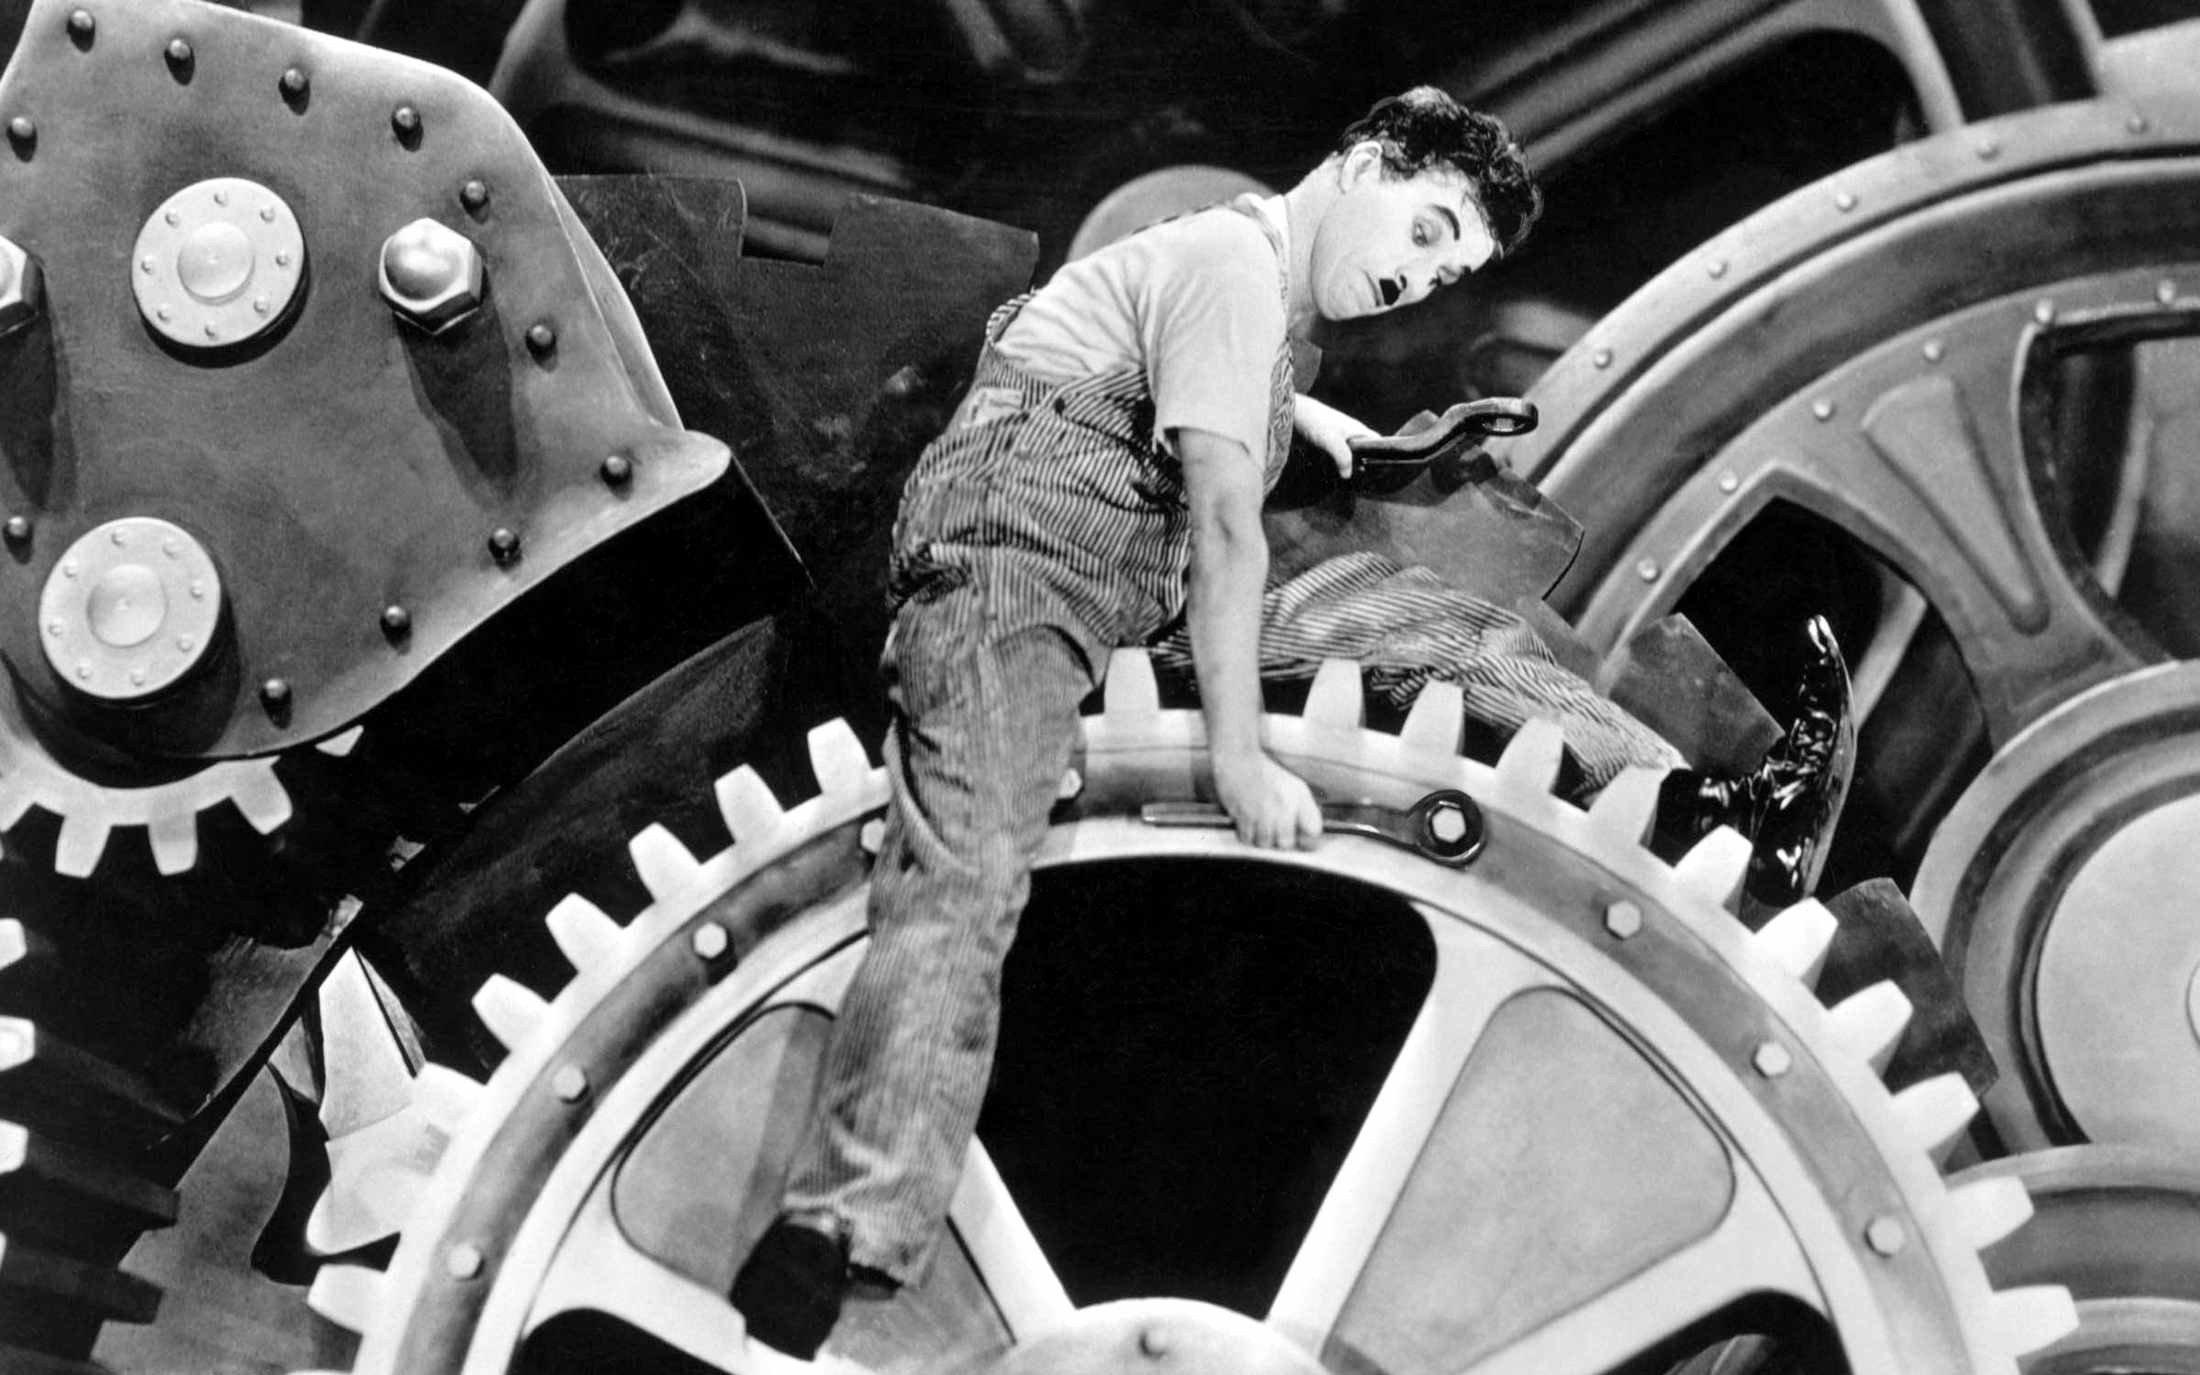 Modern Times, Charlie Chaplin, Gears, Machine Wallpaper